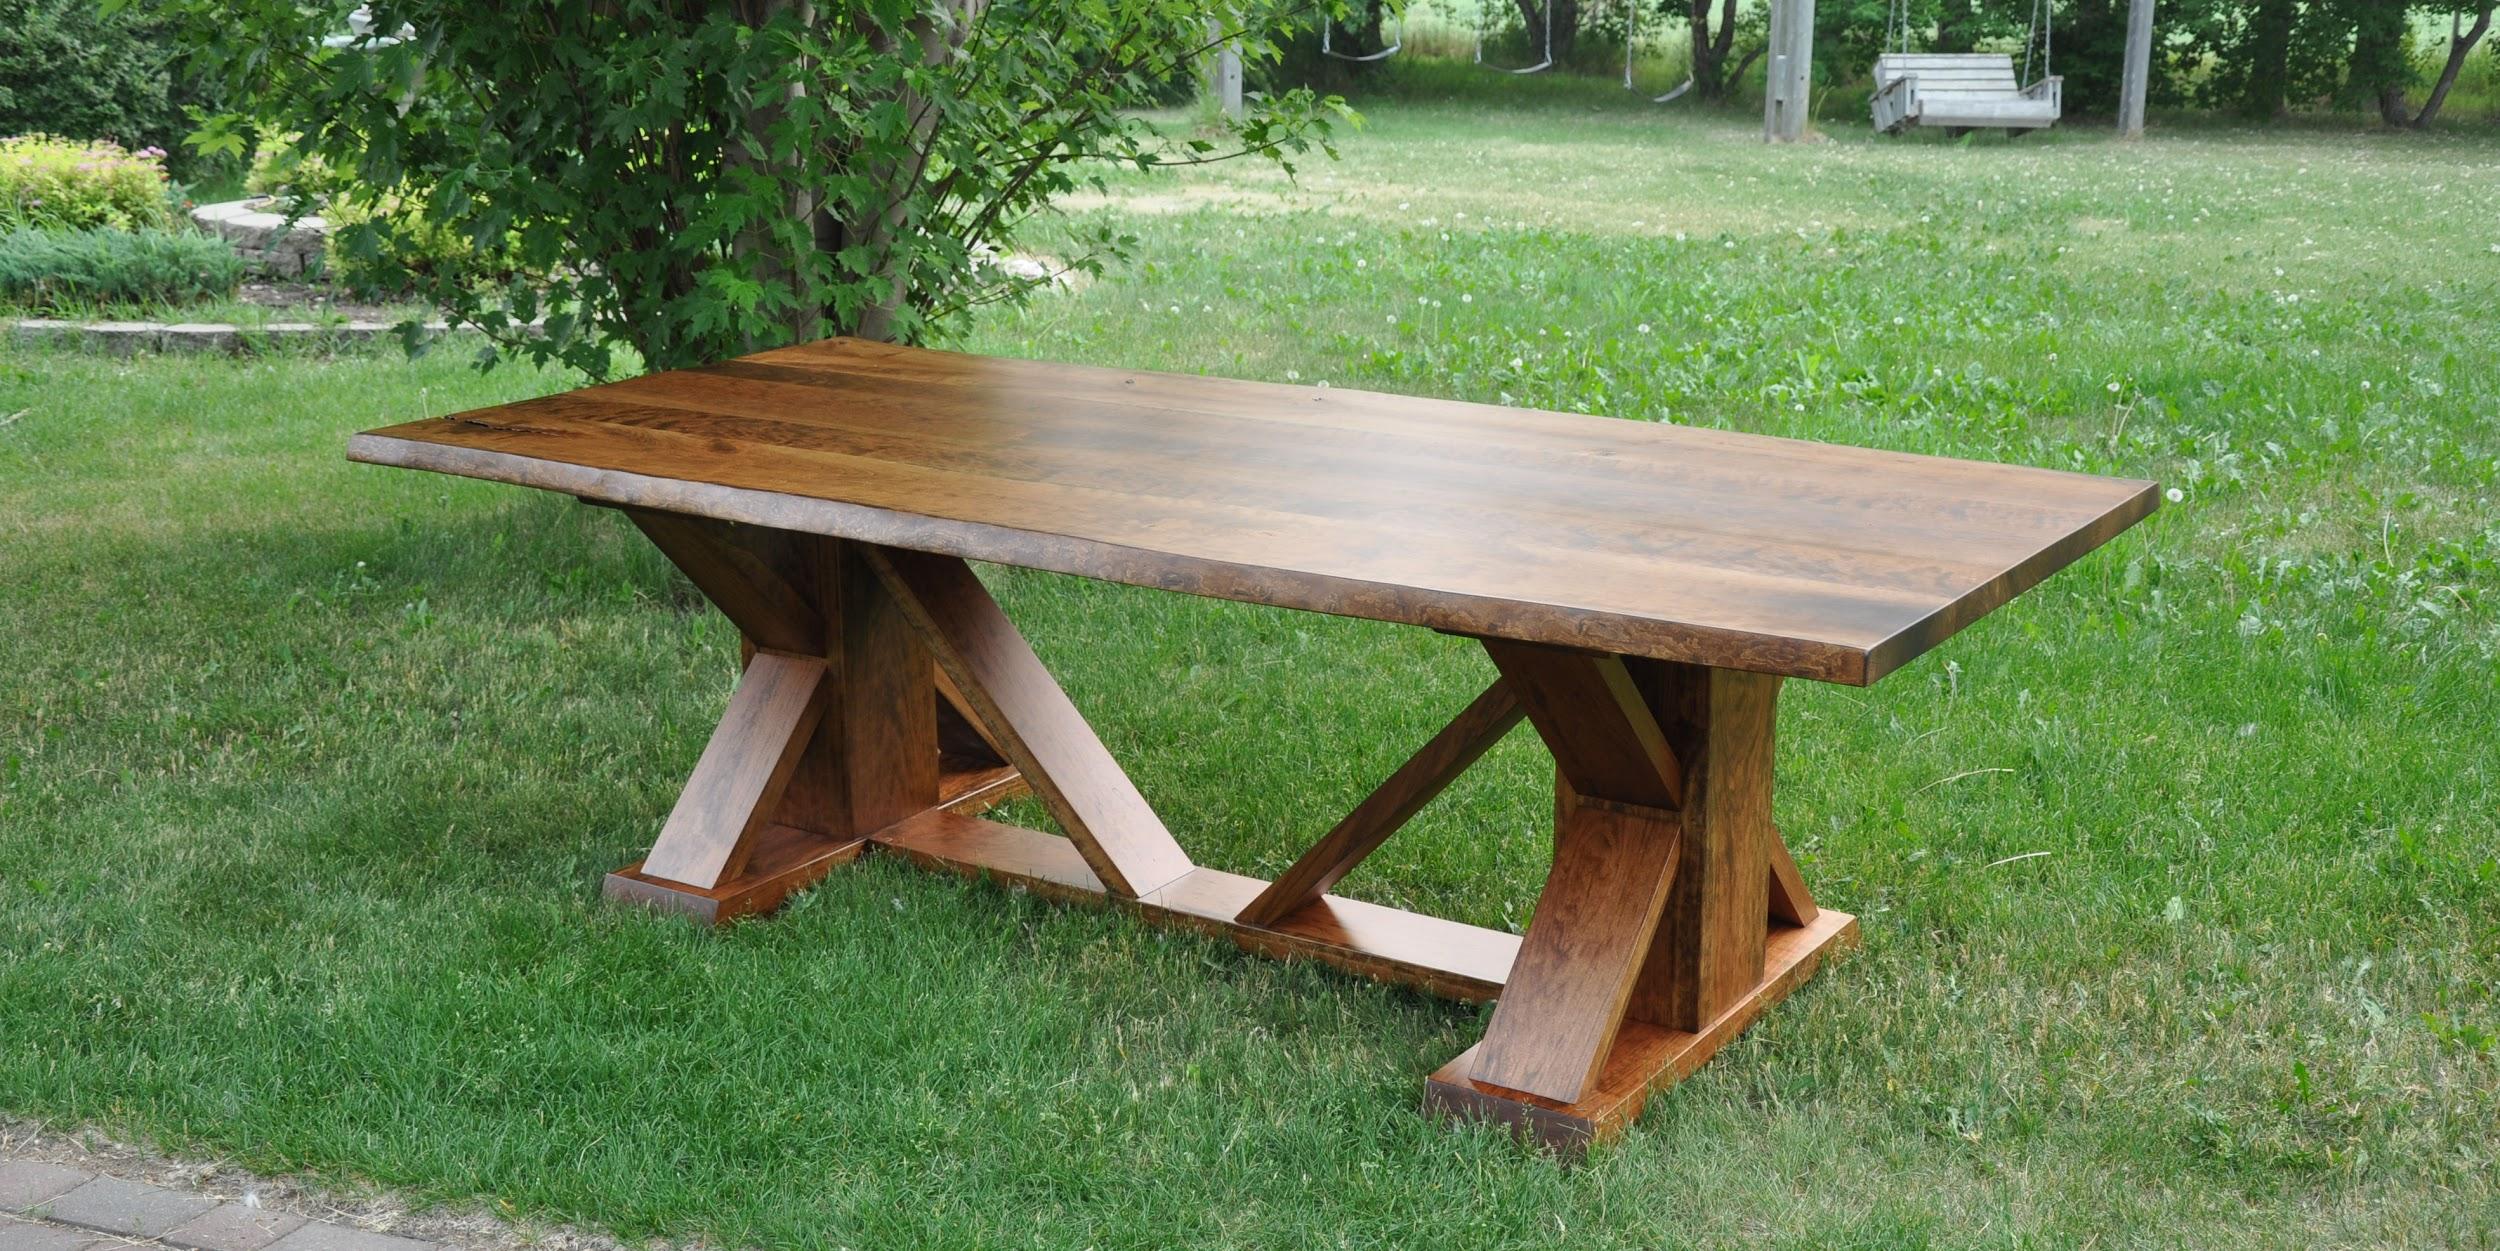 The Prairie Homestead Table